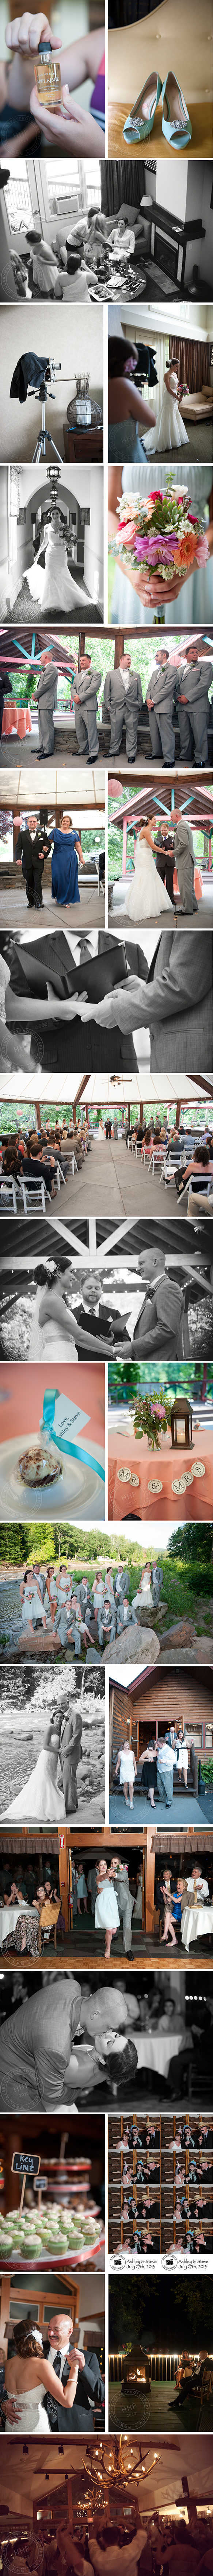 HHP AshleySteve Collage